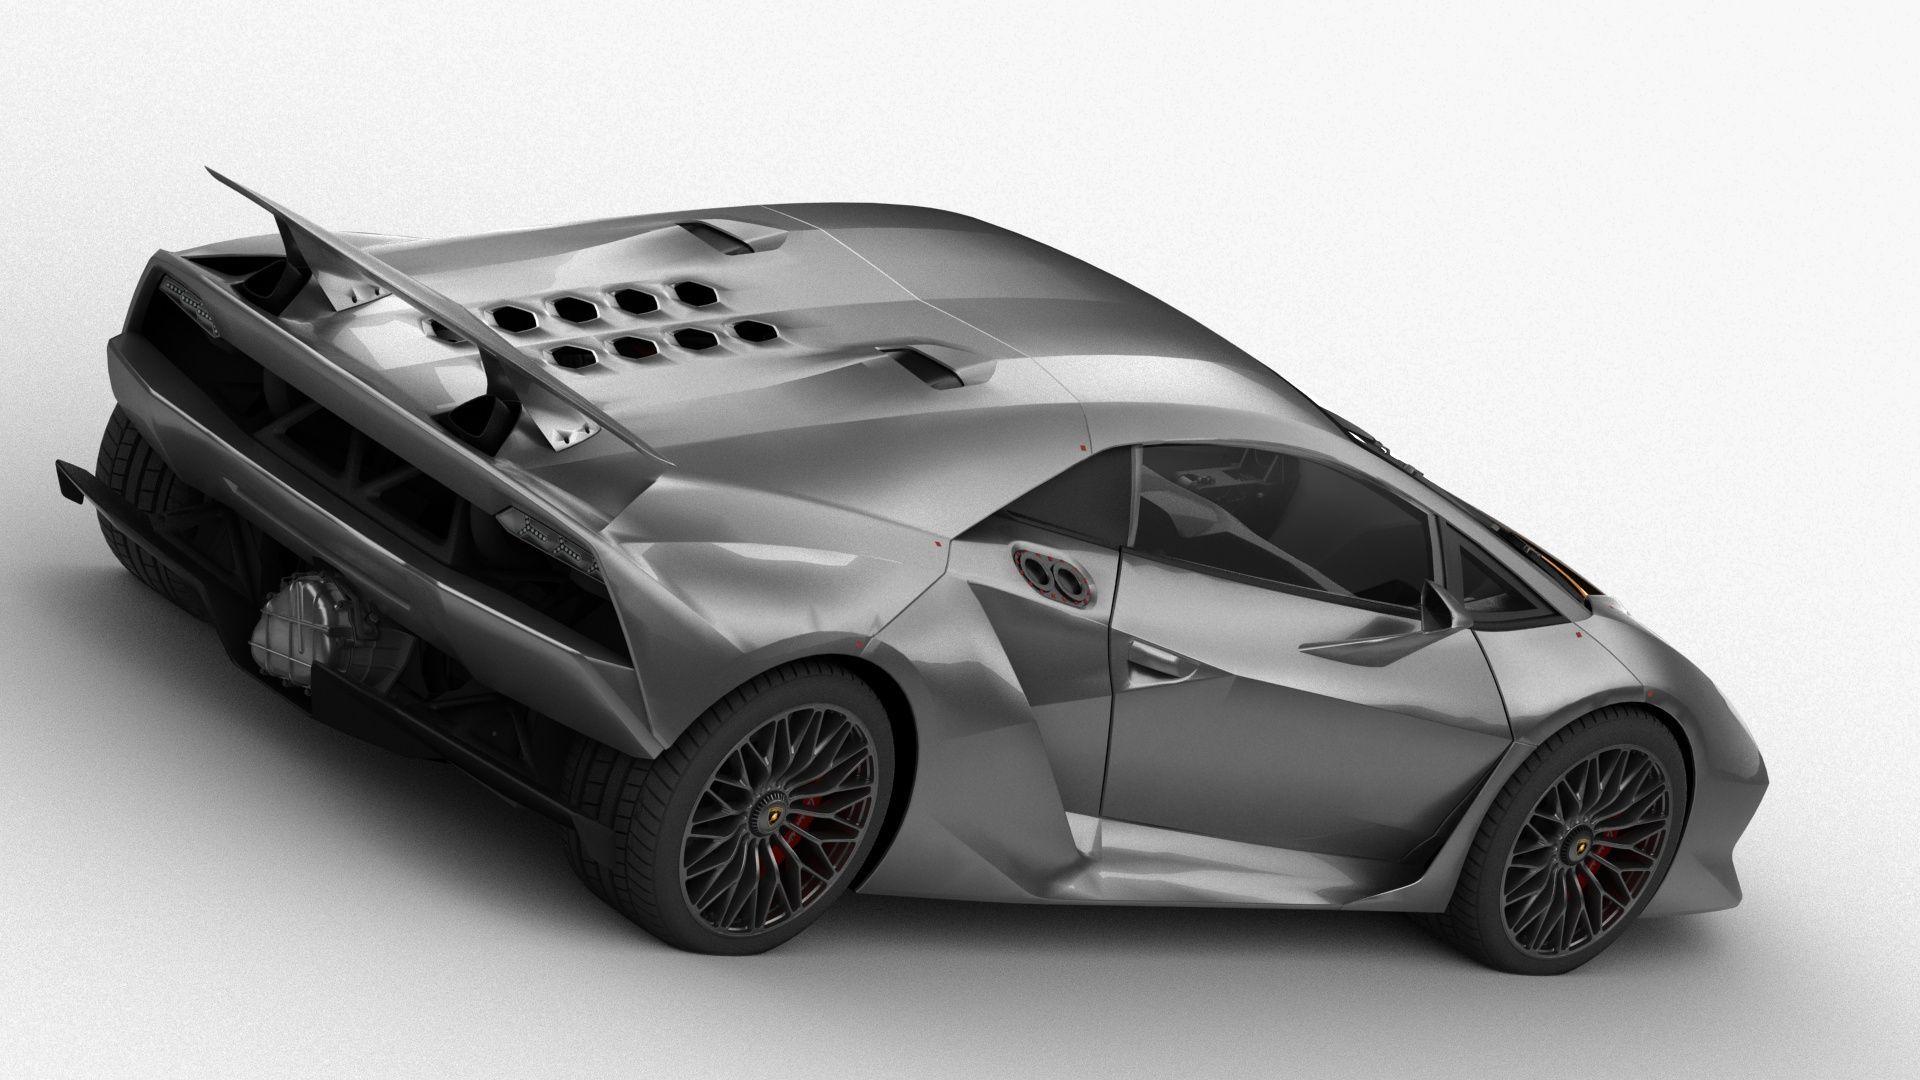 Lamborghini Sesto Elemento 2012 #Sesto, #Lamborghini, #Elemento #lamborghinisestoelemento Lamborghini Sesto Elemento 2012 #Sesto, #Lamborghini, #Elemento #lamborghinisestoelemento